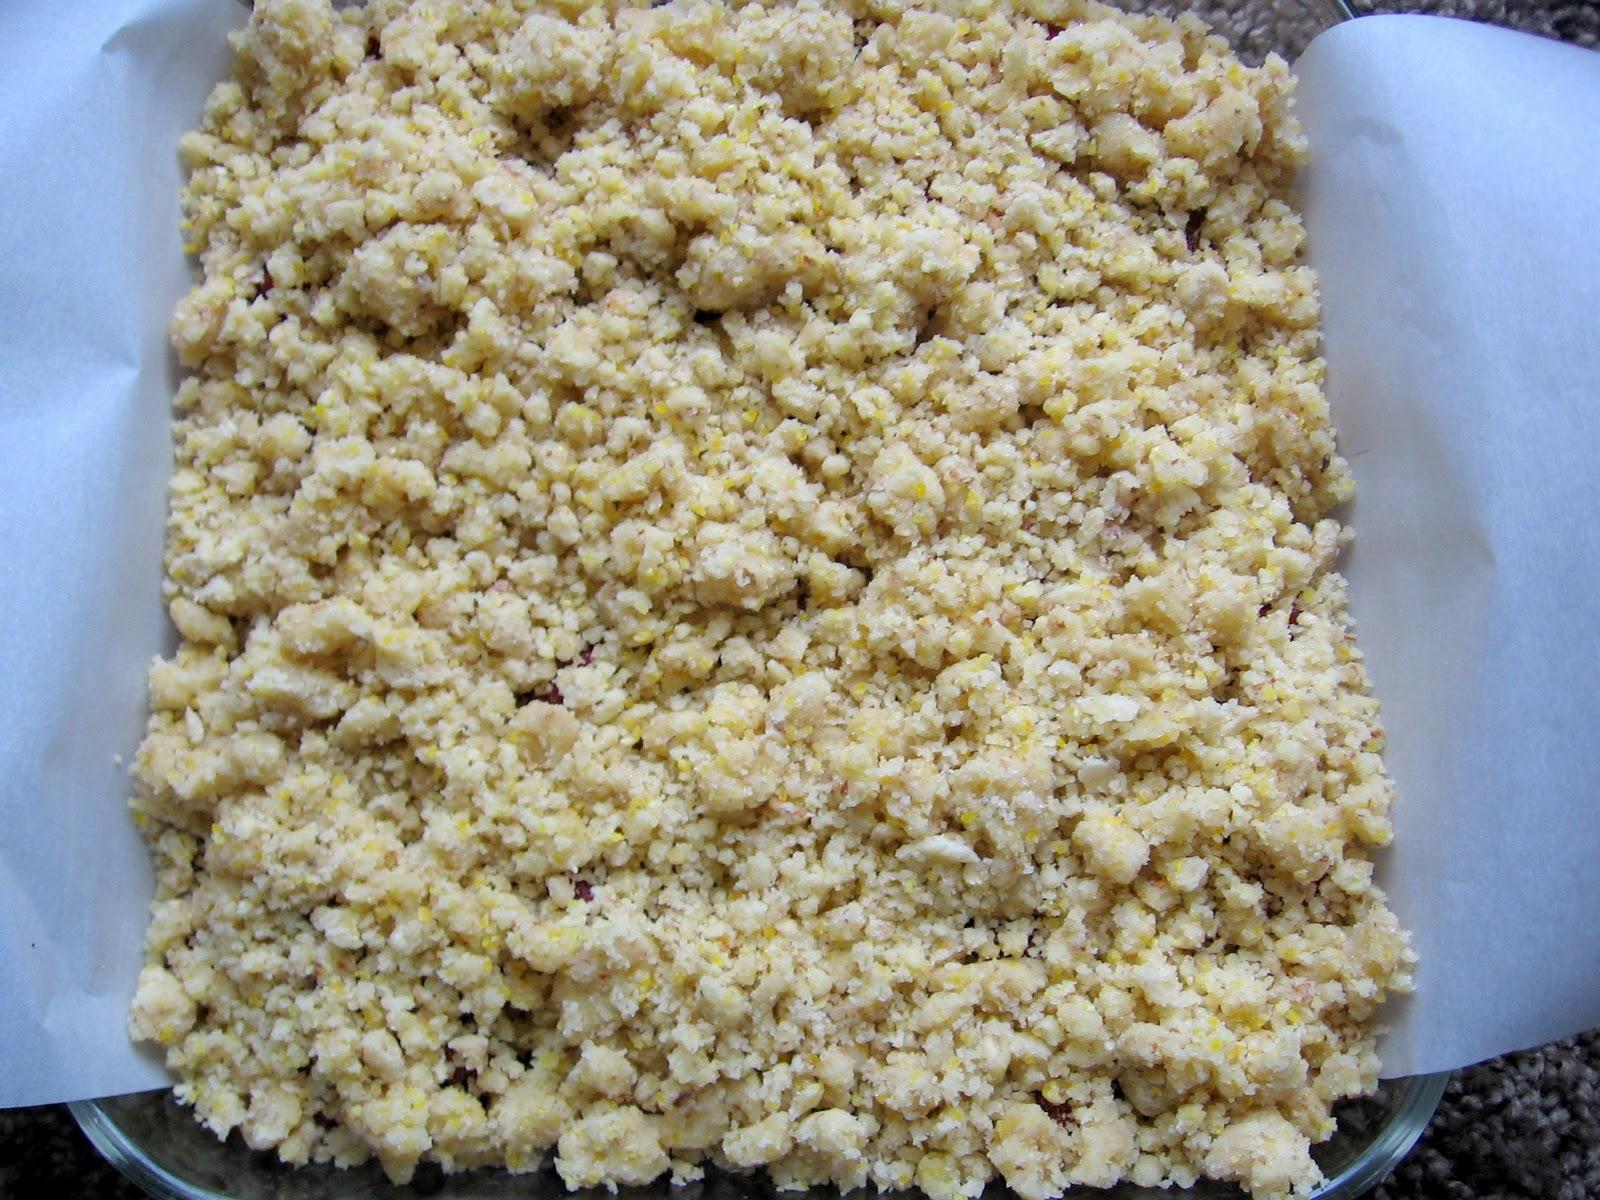 Food Tastes Good!: Raspberry Cornmeal Crumble Bars